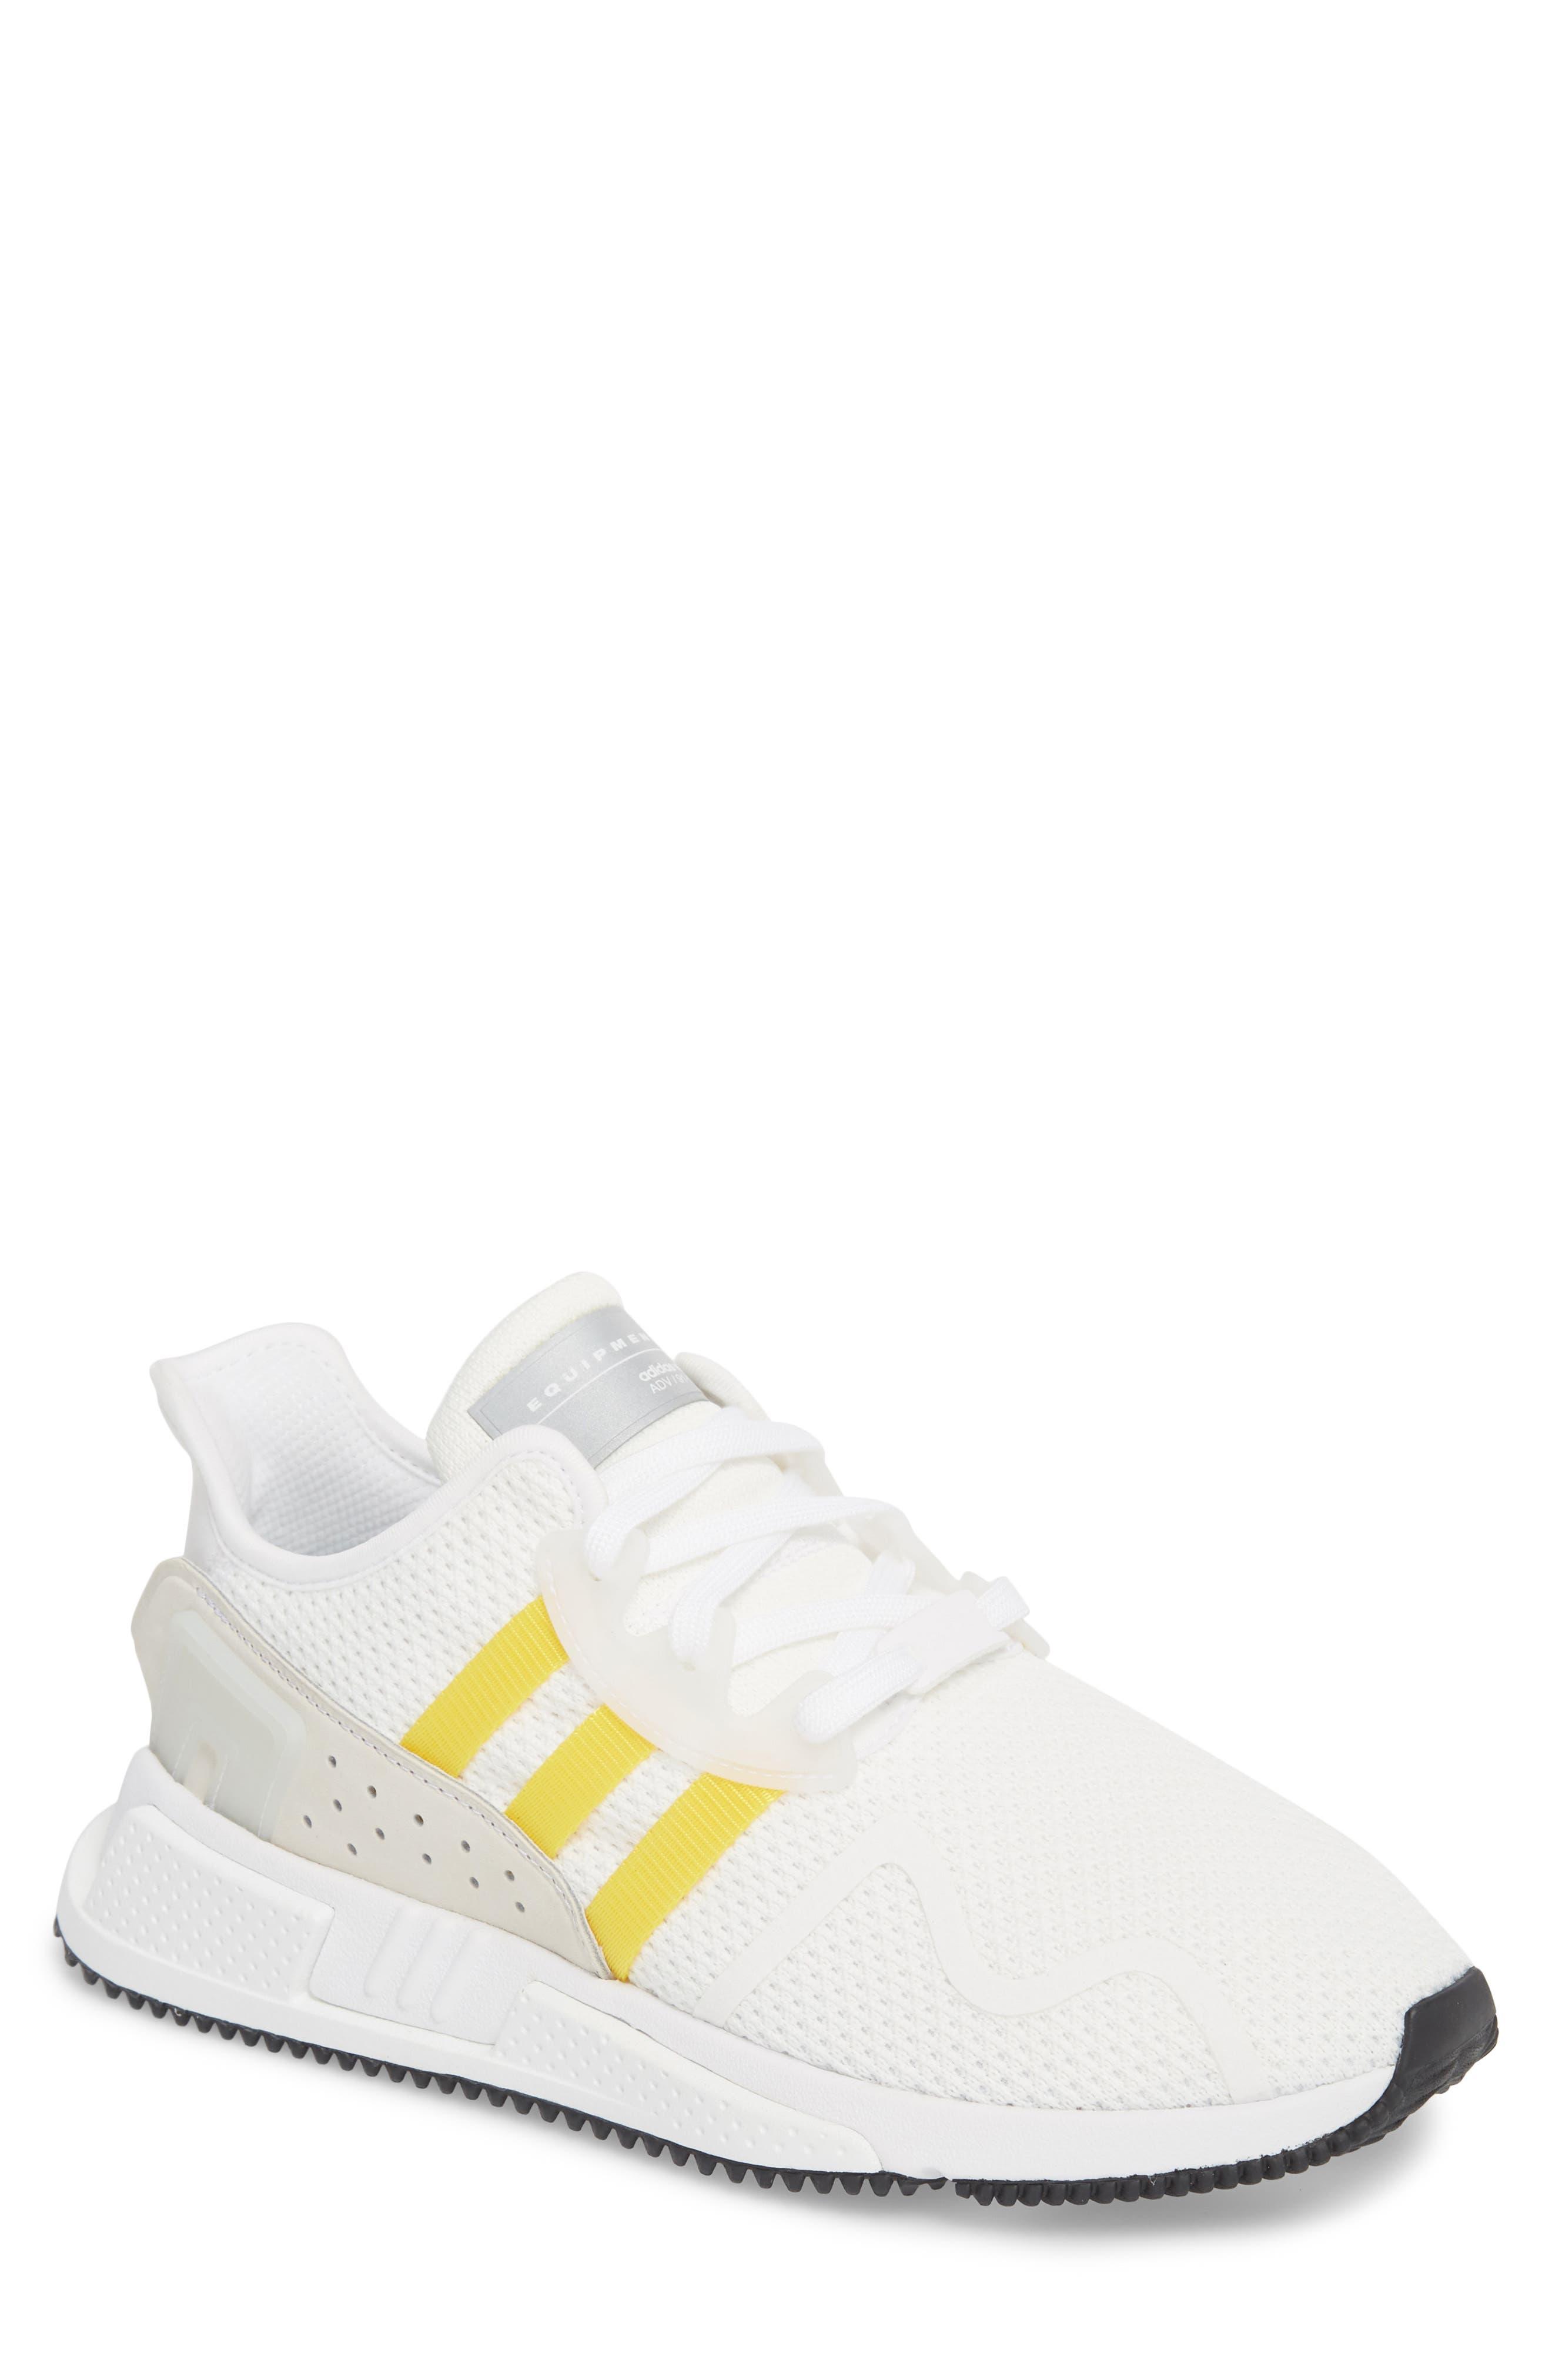 EQT Cushion ADV Sneaker,                             Main thumbnail 1, color,                             WHITE/ SILVER